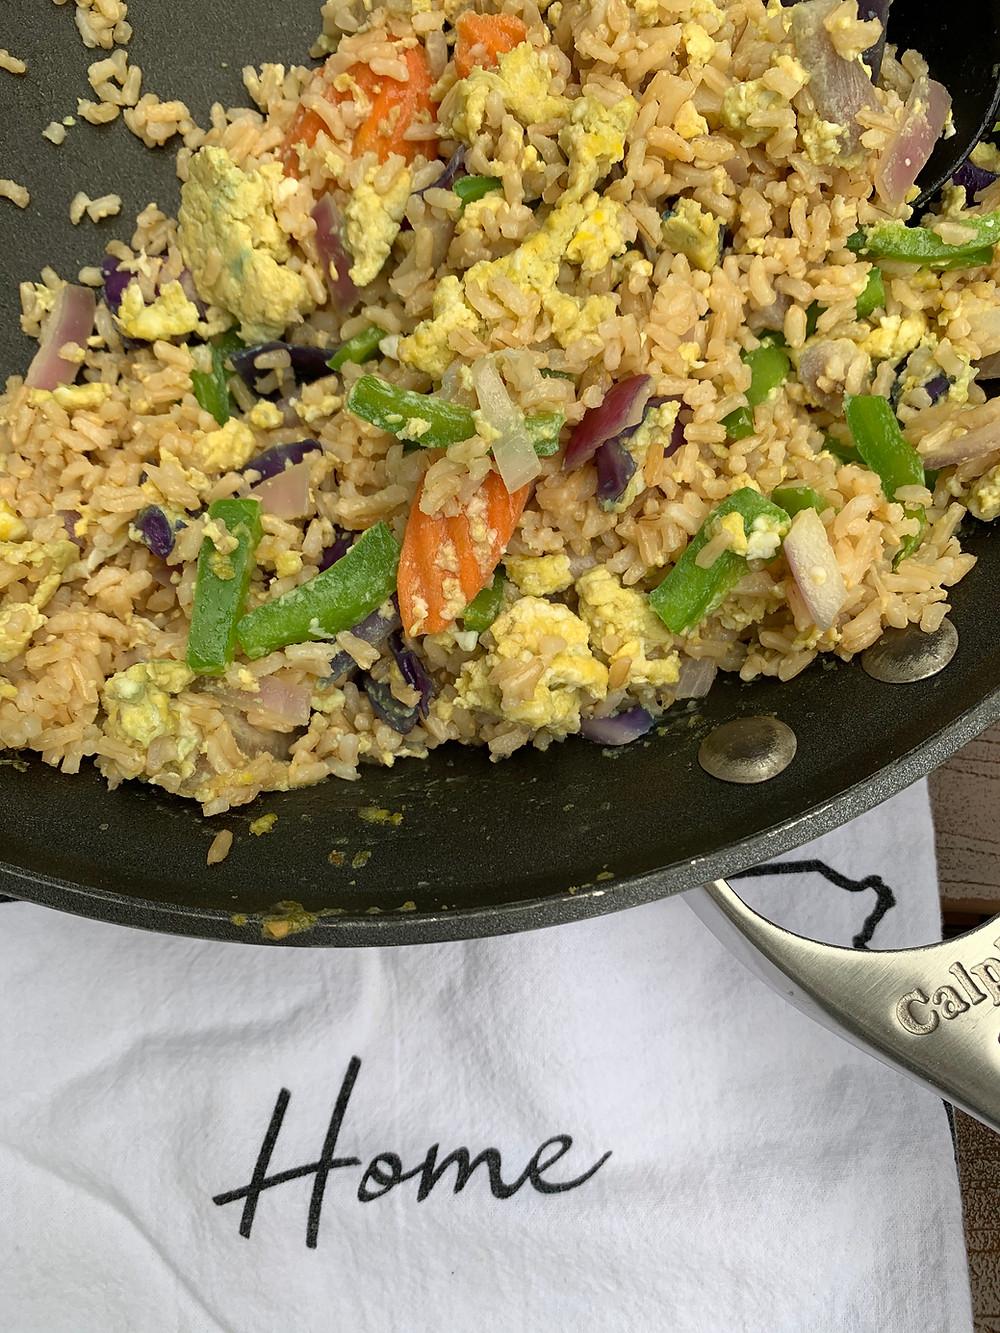 Egg stir fry dinner for runners and athletes.